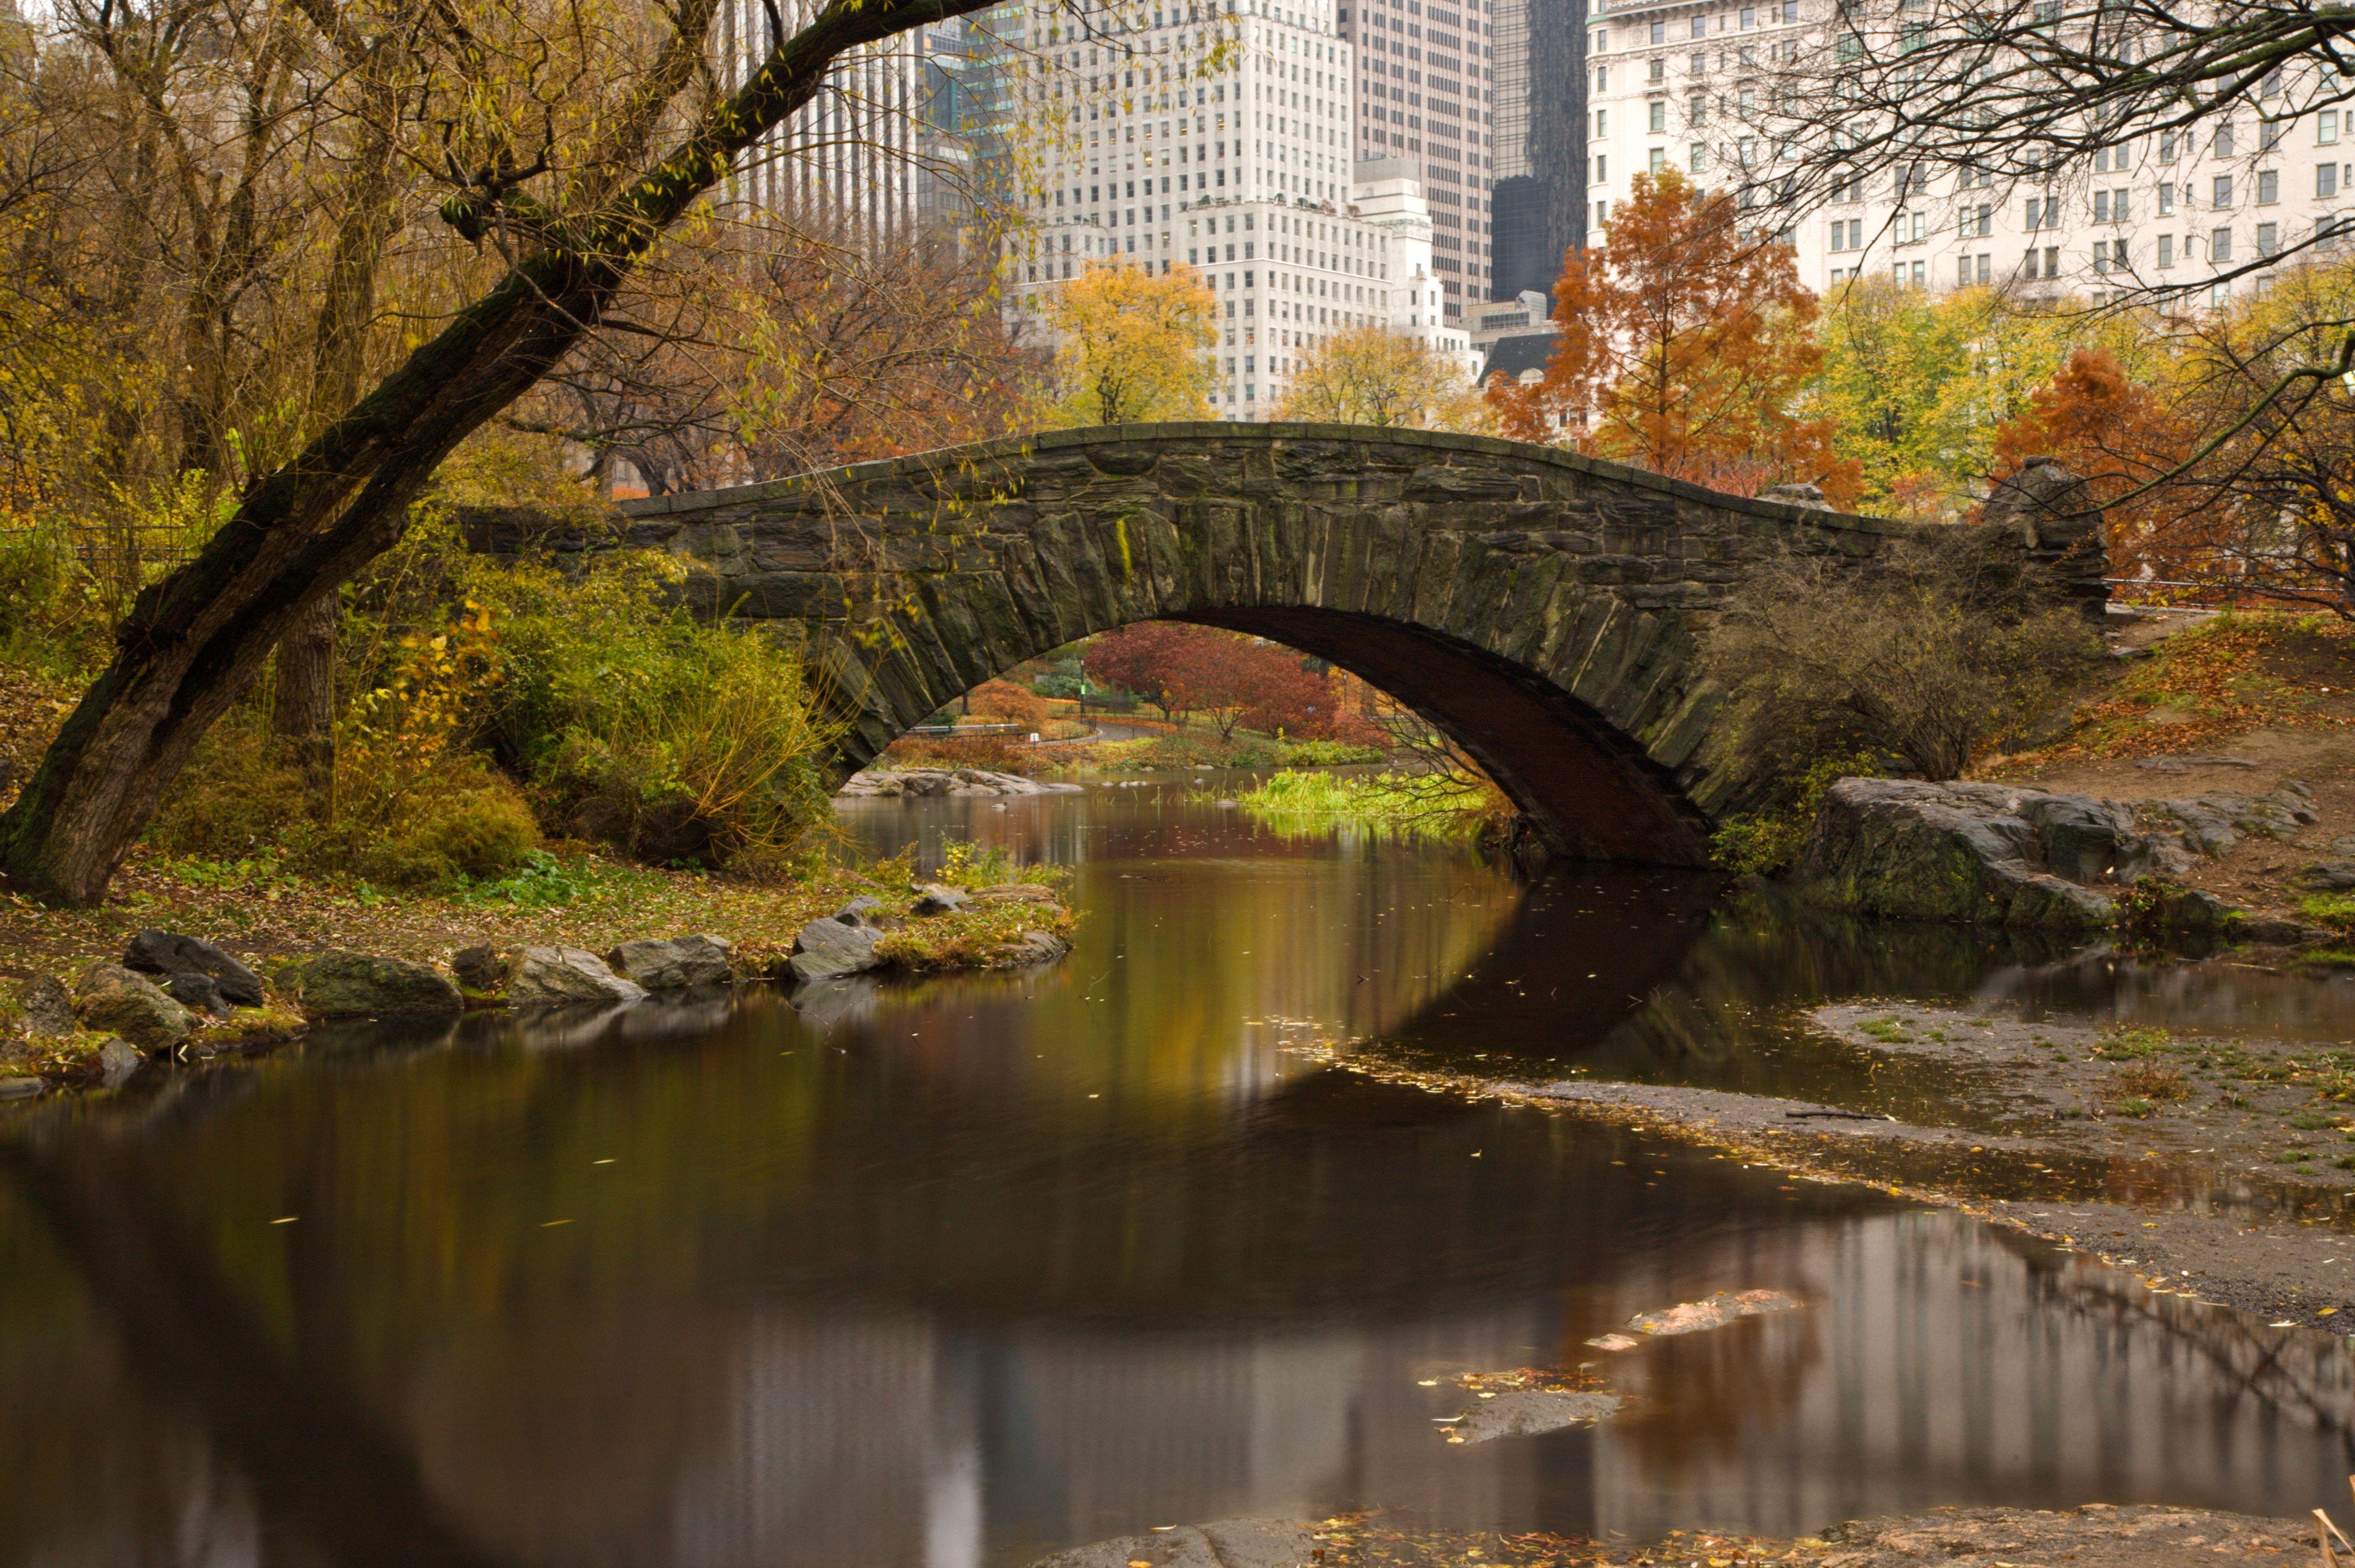 nyc in november Gapstow bridge